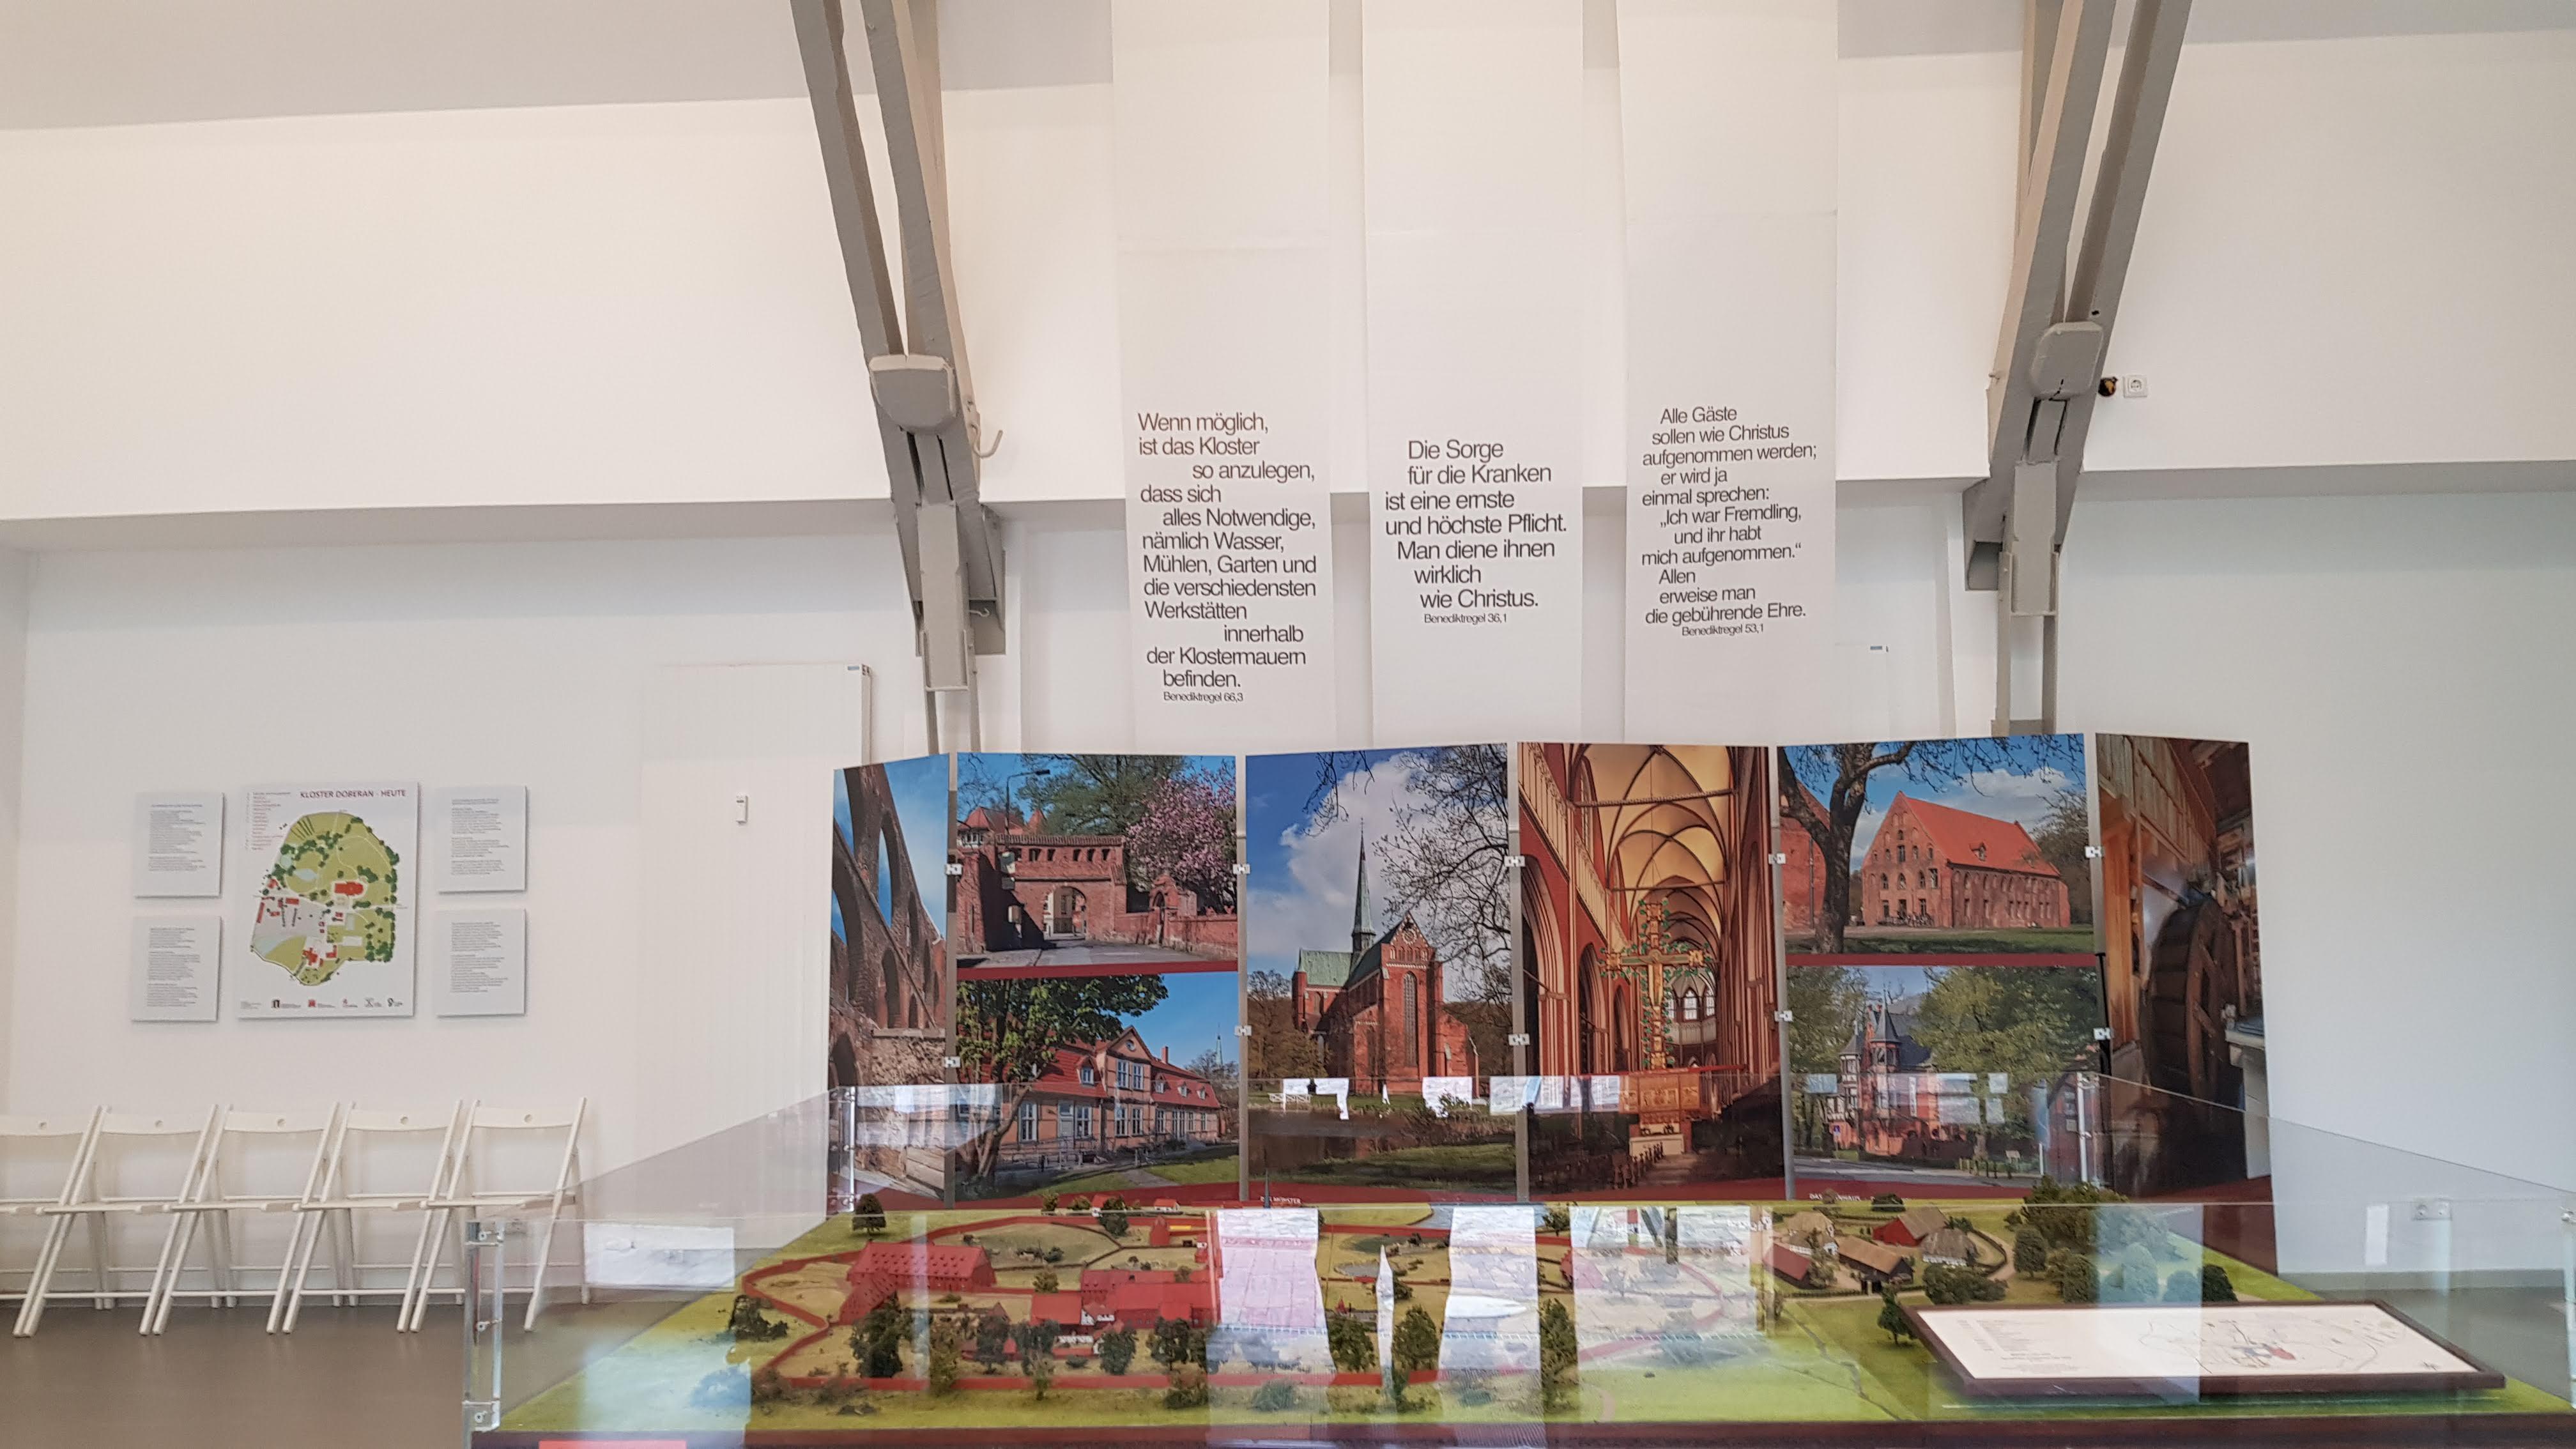 Besucherzentrum des Klosters Doberan